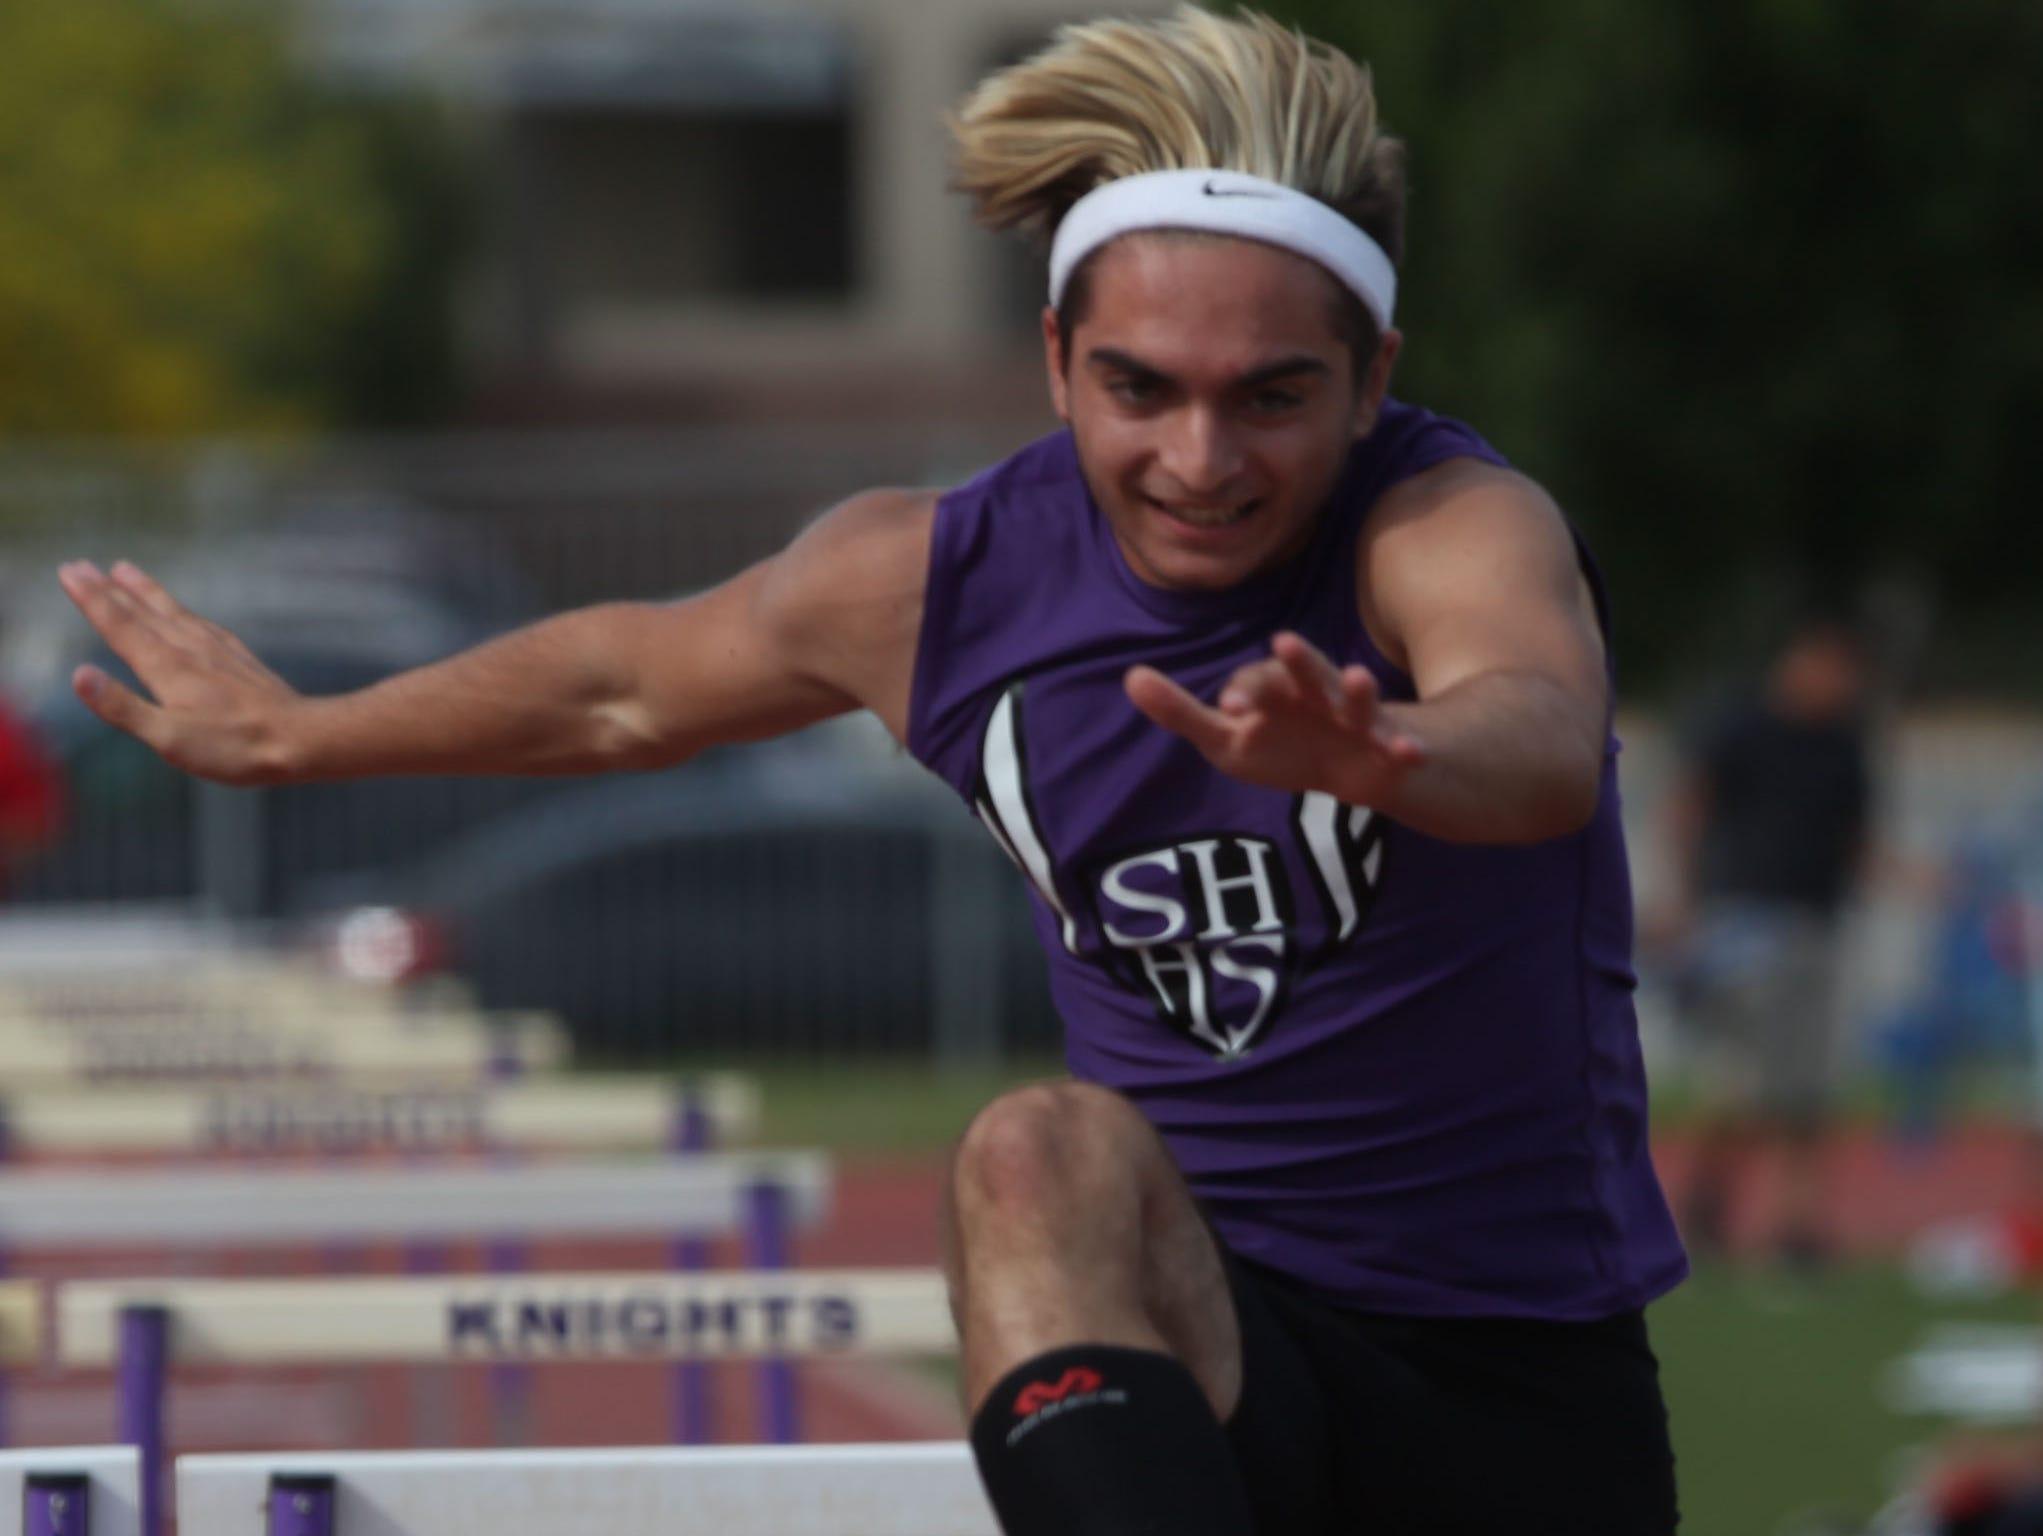 Shadow Hills High School's Gavin Palazzo wins the 100 meter hurdles against Rancho Mirage High School runners in Indio.